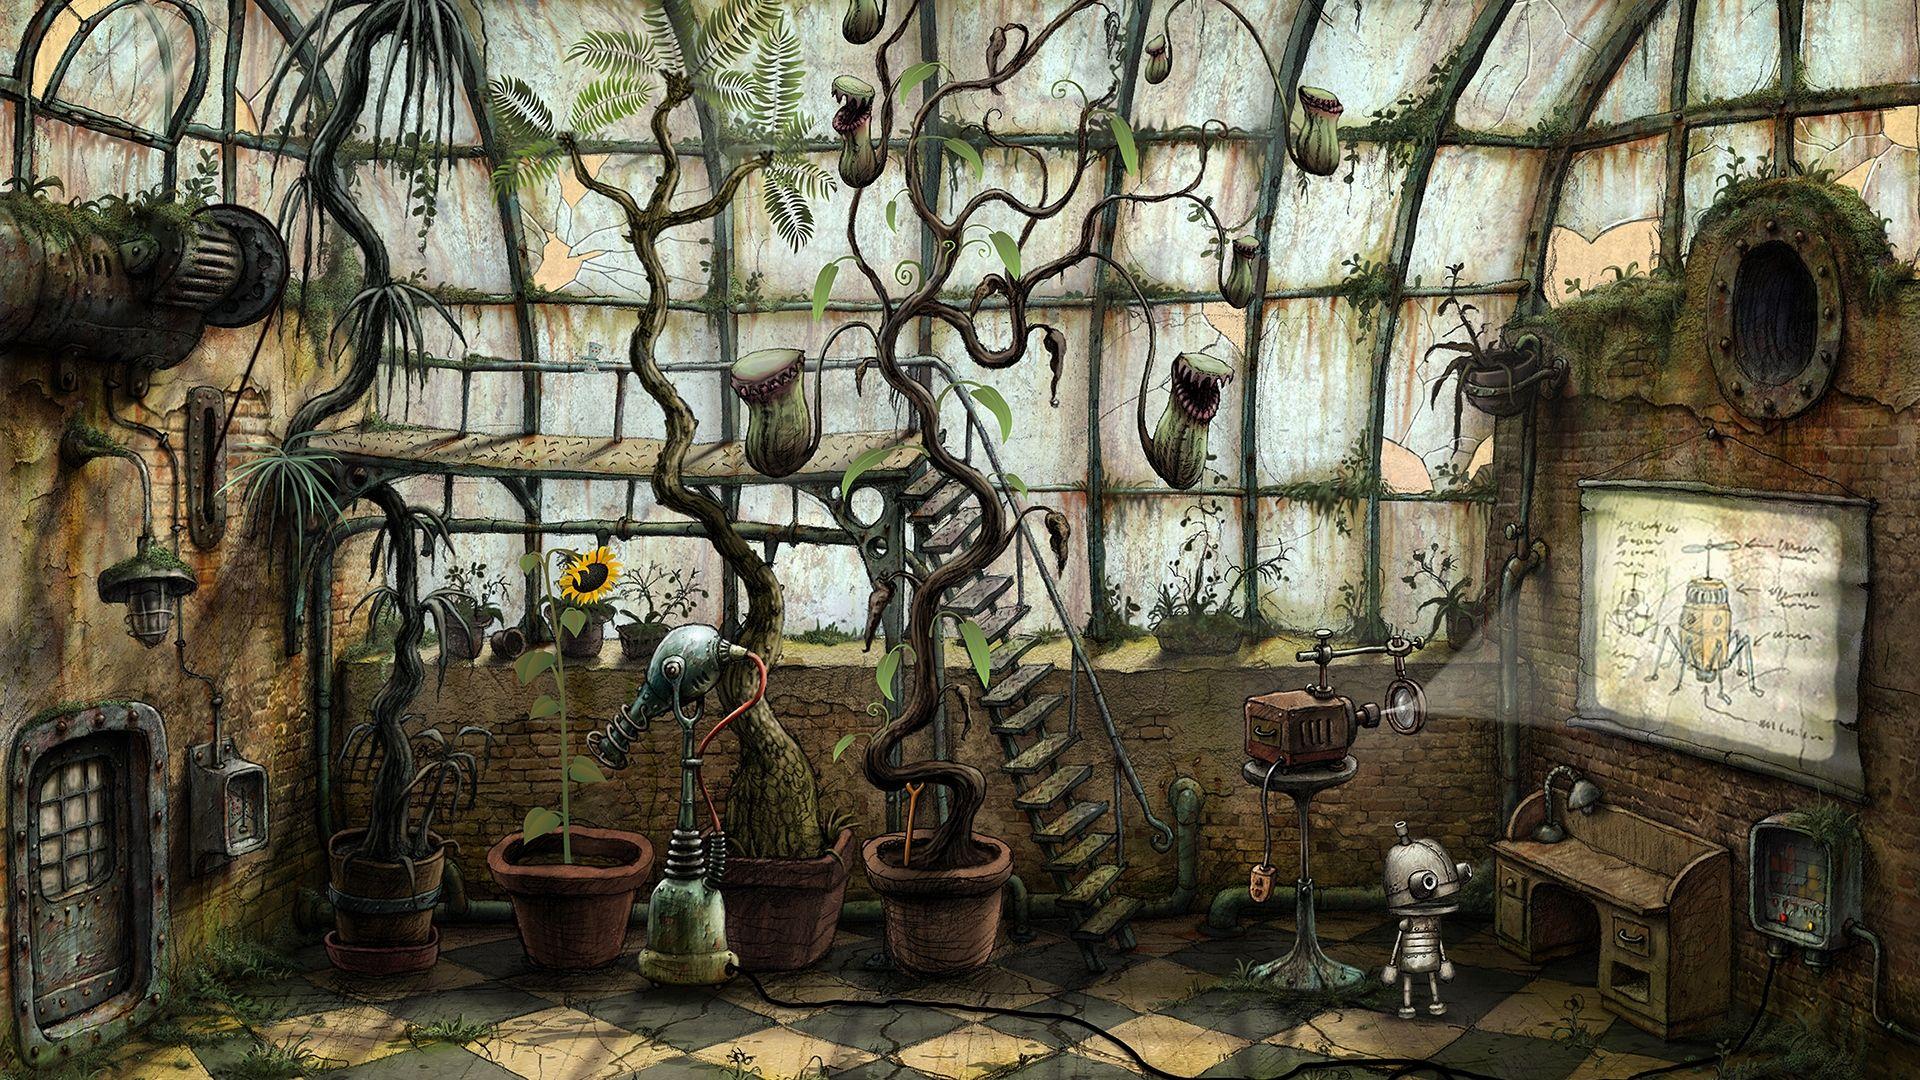 Gaming Wallpapers Collection Album On Imgur Amanita Design Art Inspiration Painting Steampunk Art